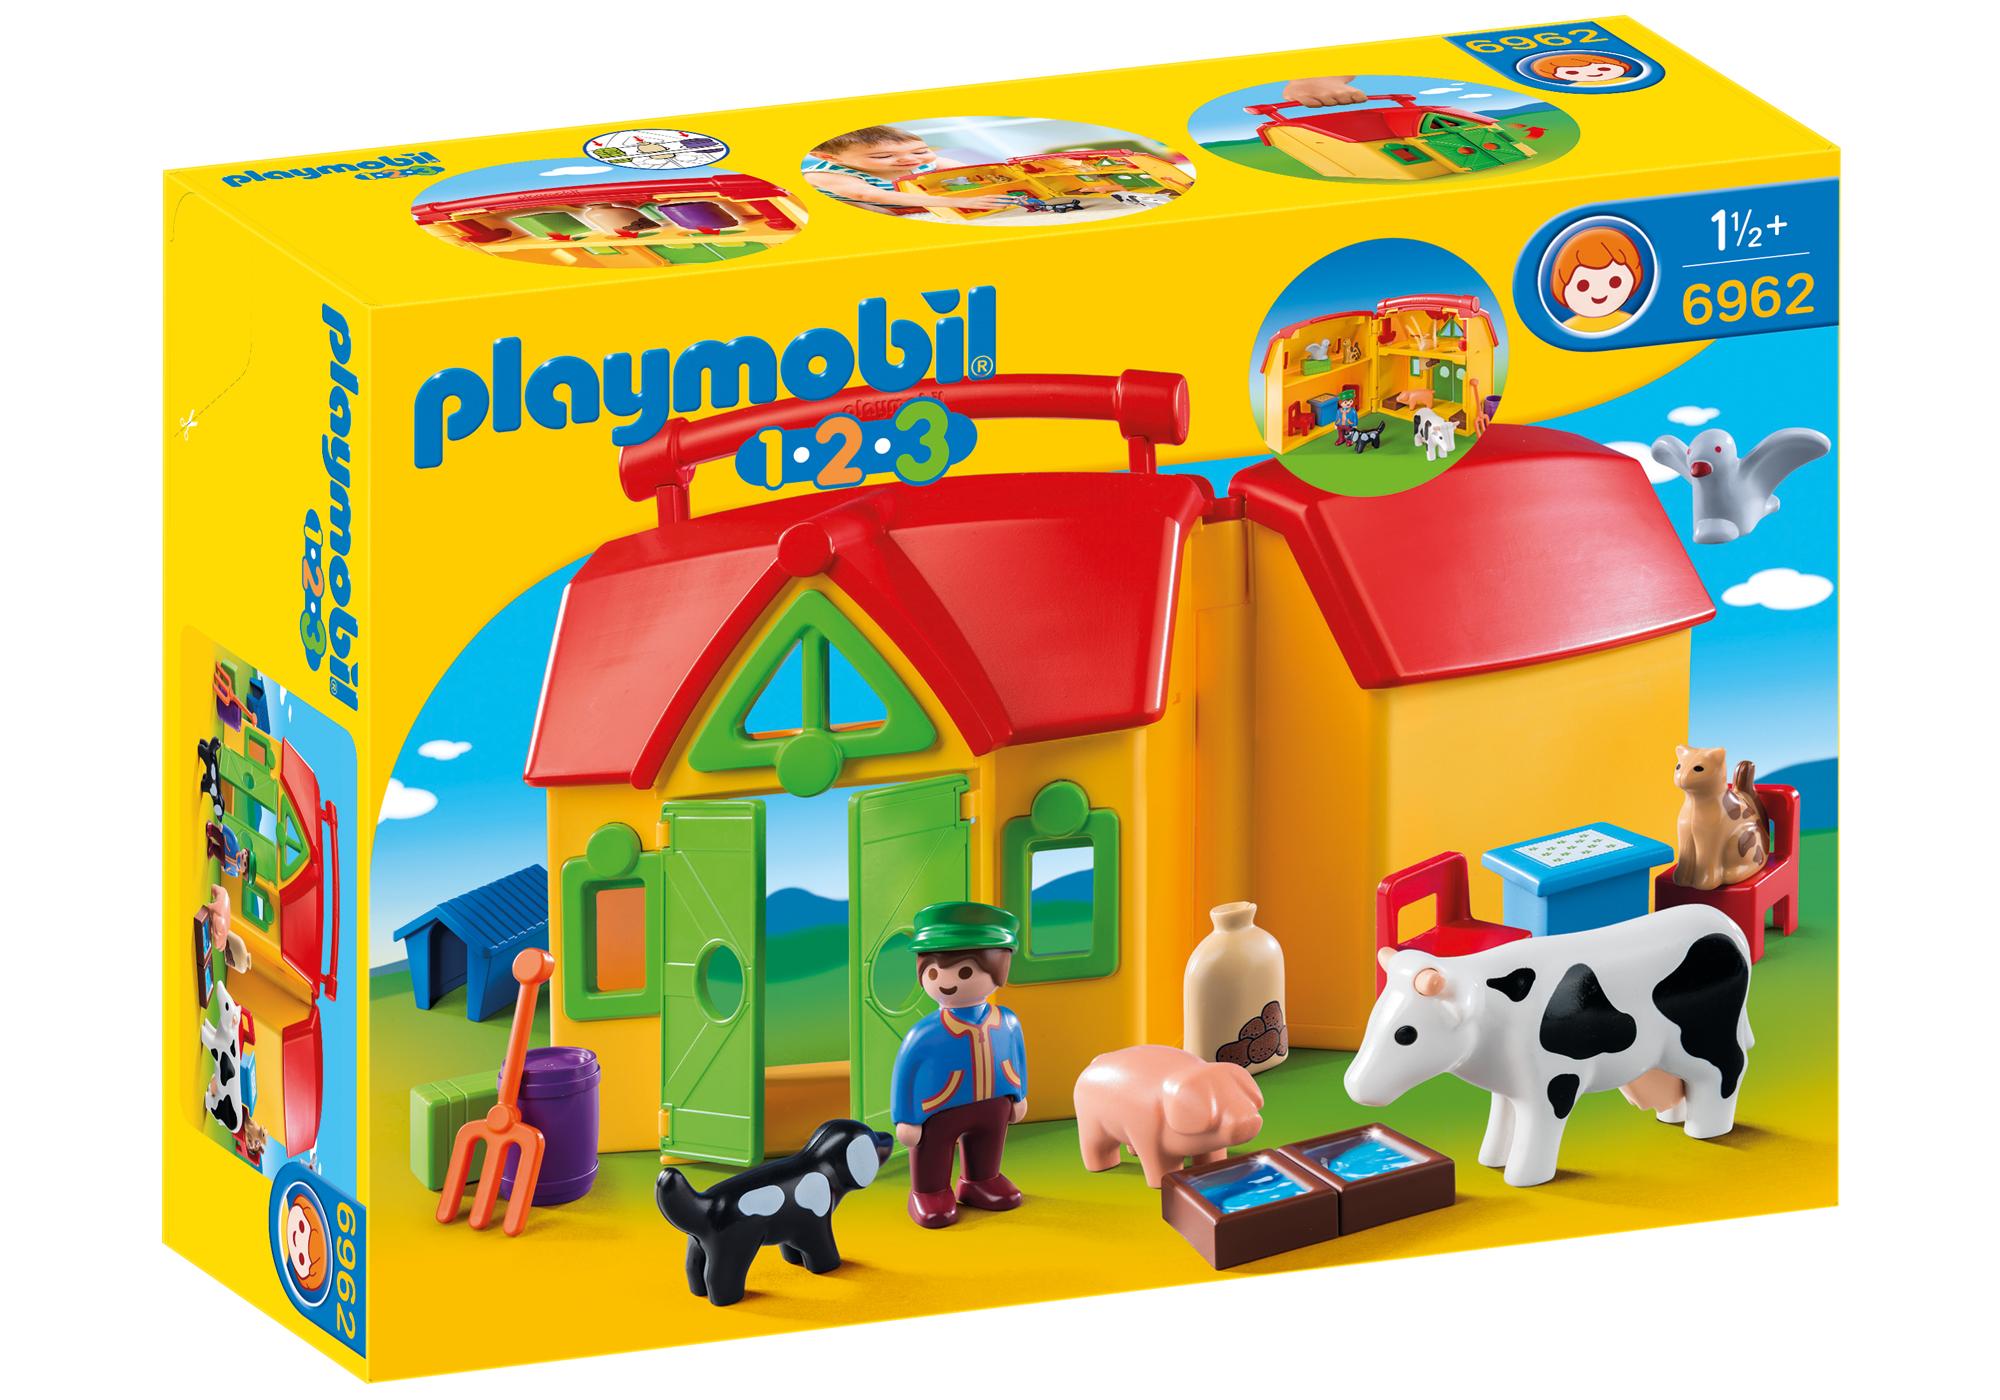 http://media.playmobil.com/i/playmobil/6962_product_box_front/Moje przenośne gospodarstwo rolne